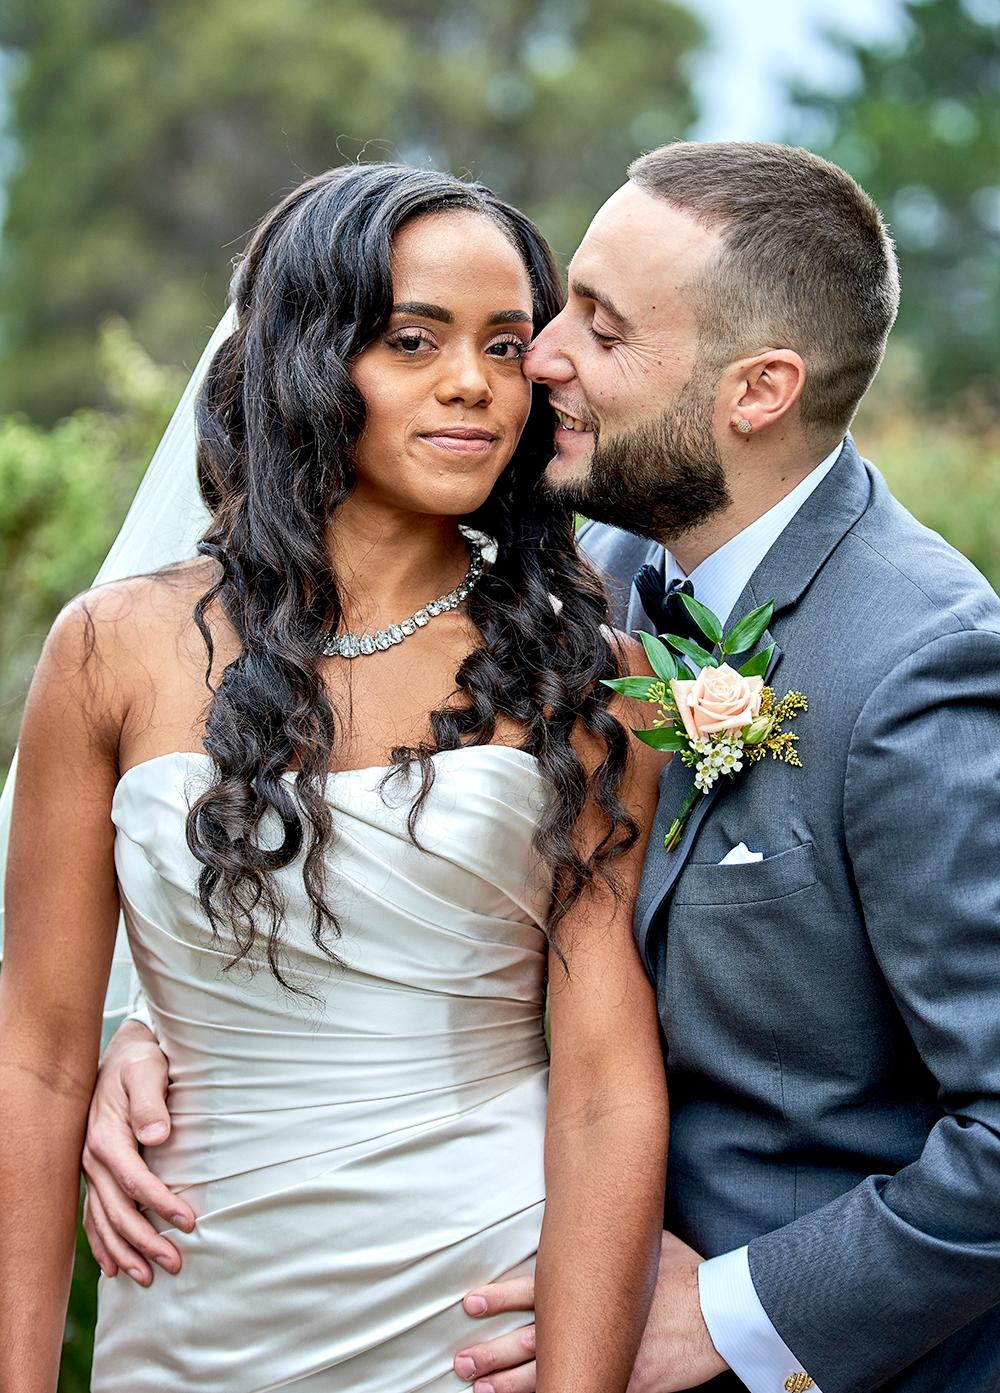 2017KrystalCraven-bride-and-groom-posed-portrait